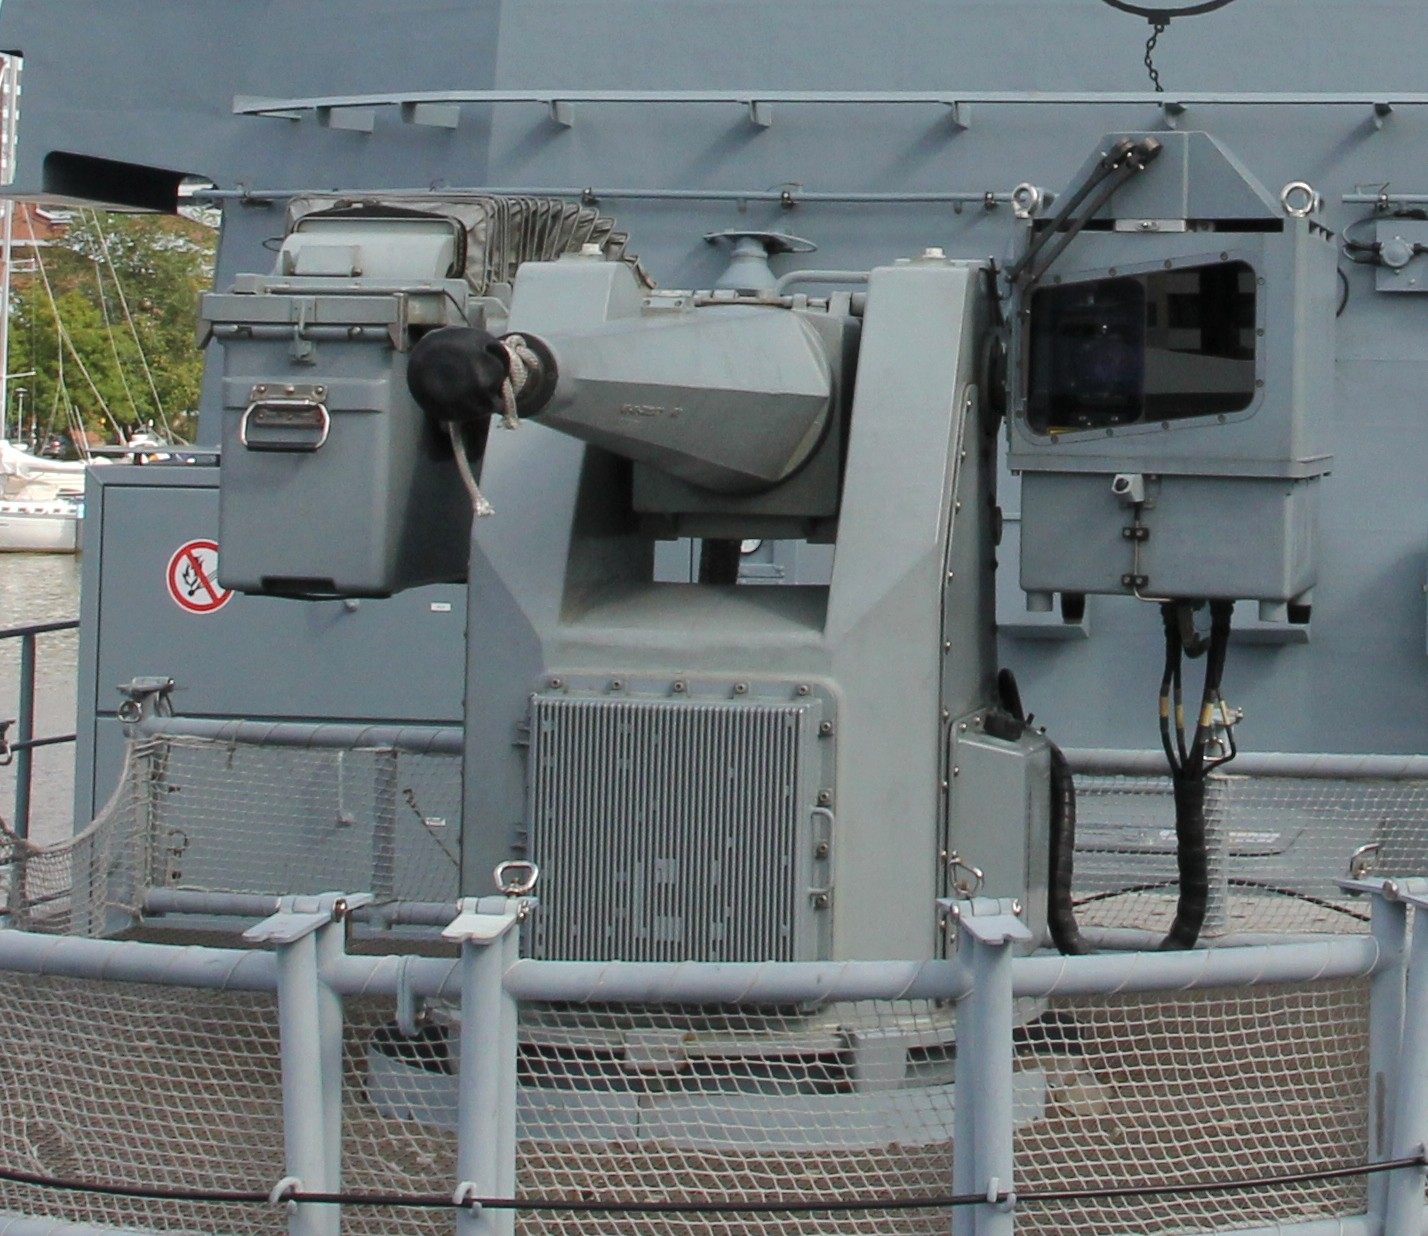 Mlg 27 27mm Machine Gun System German Navy